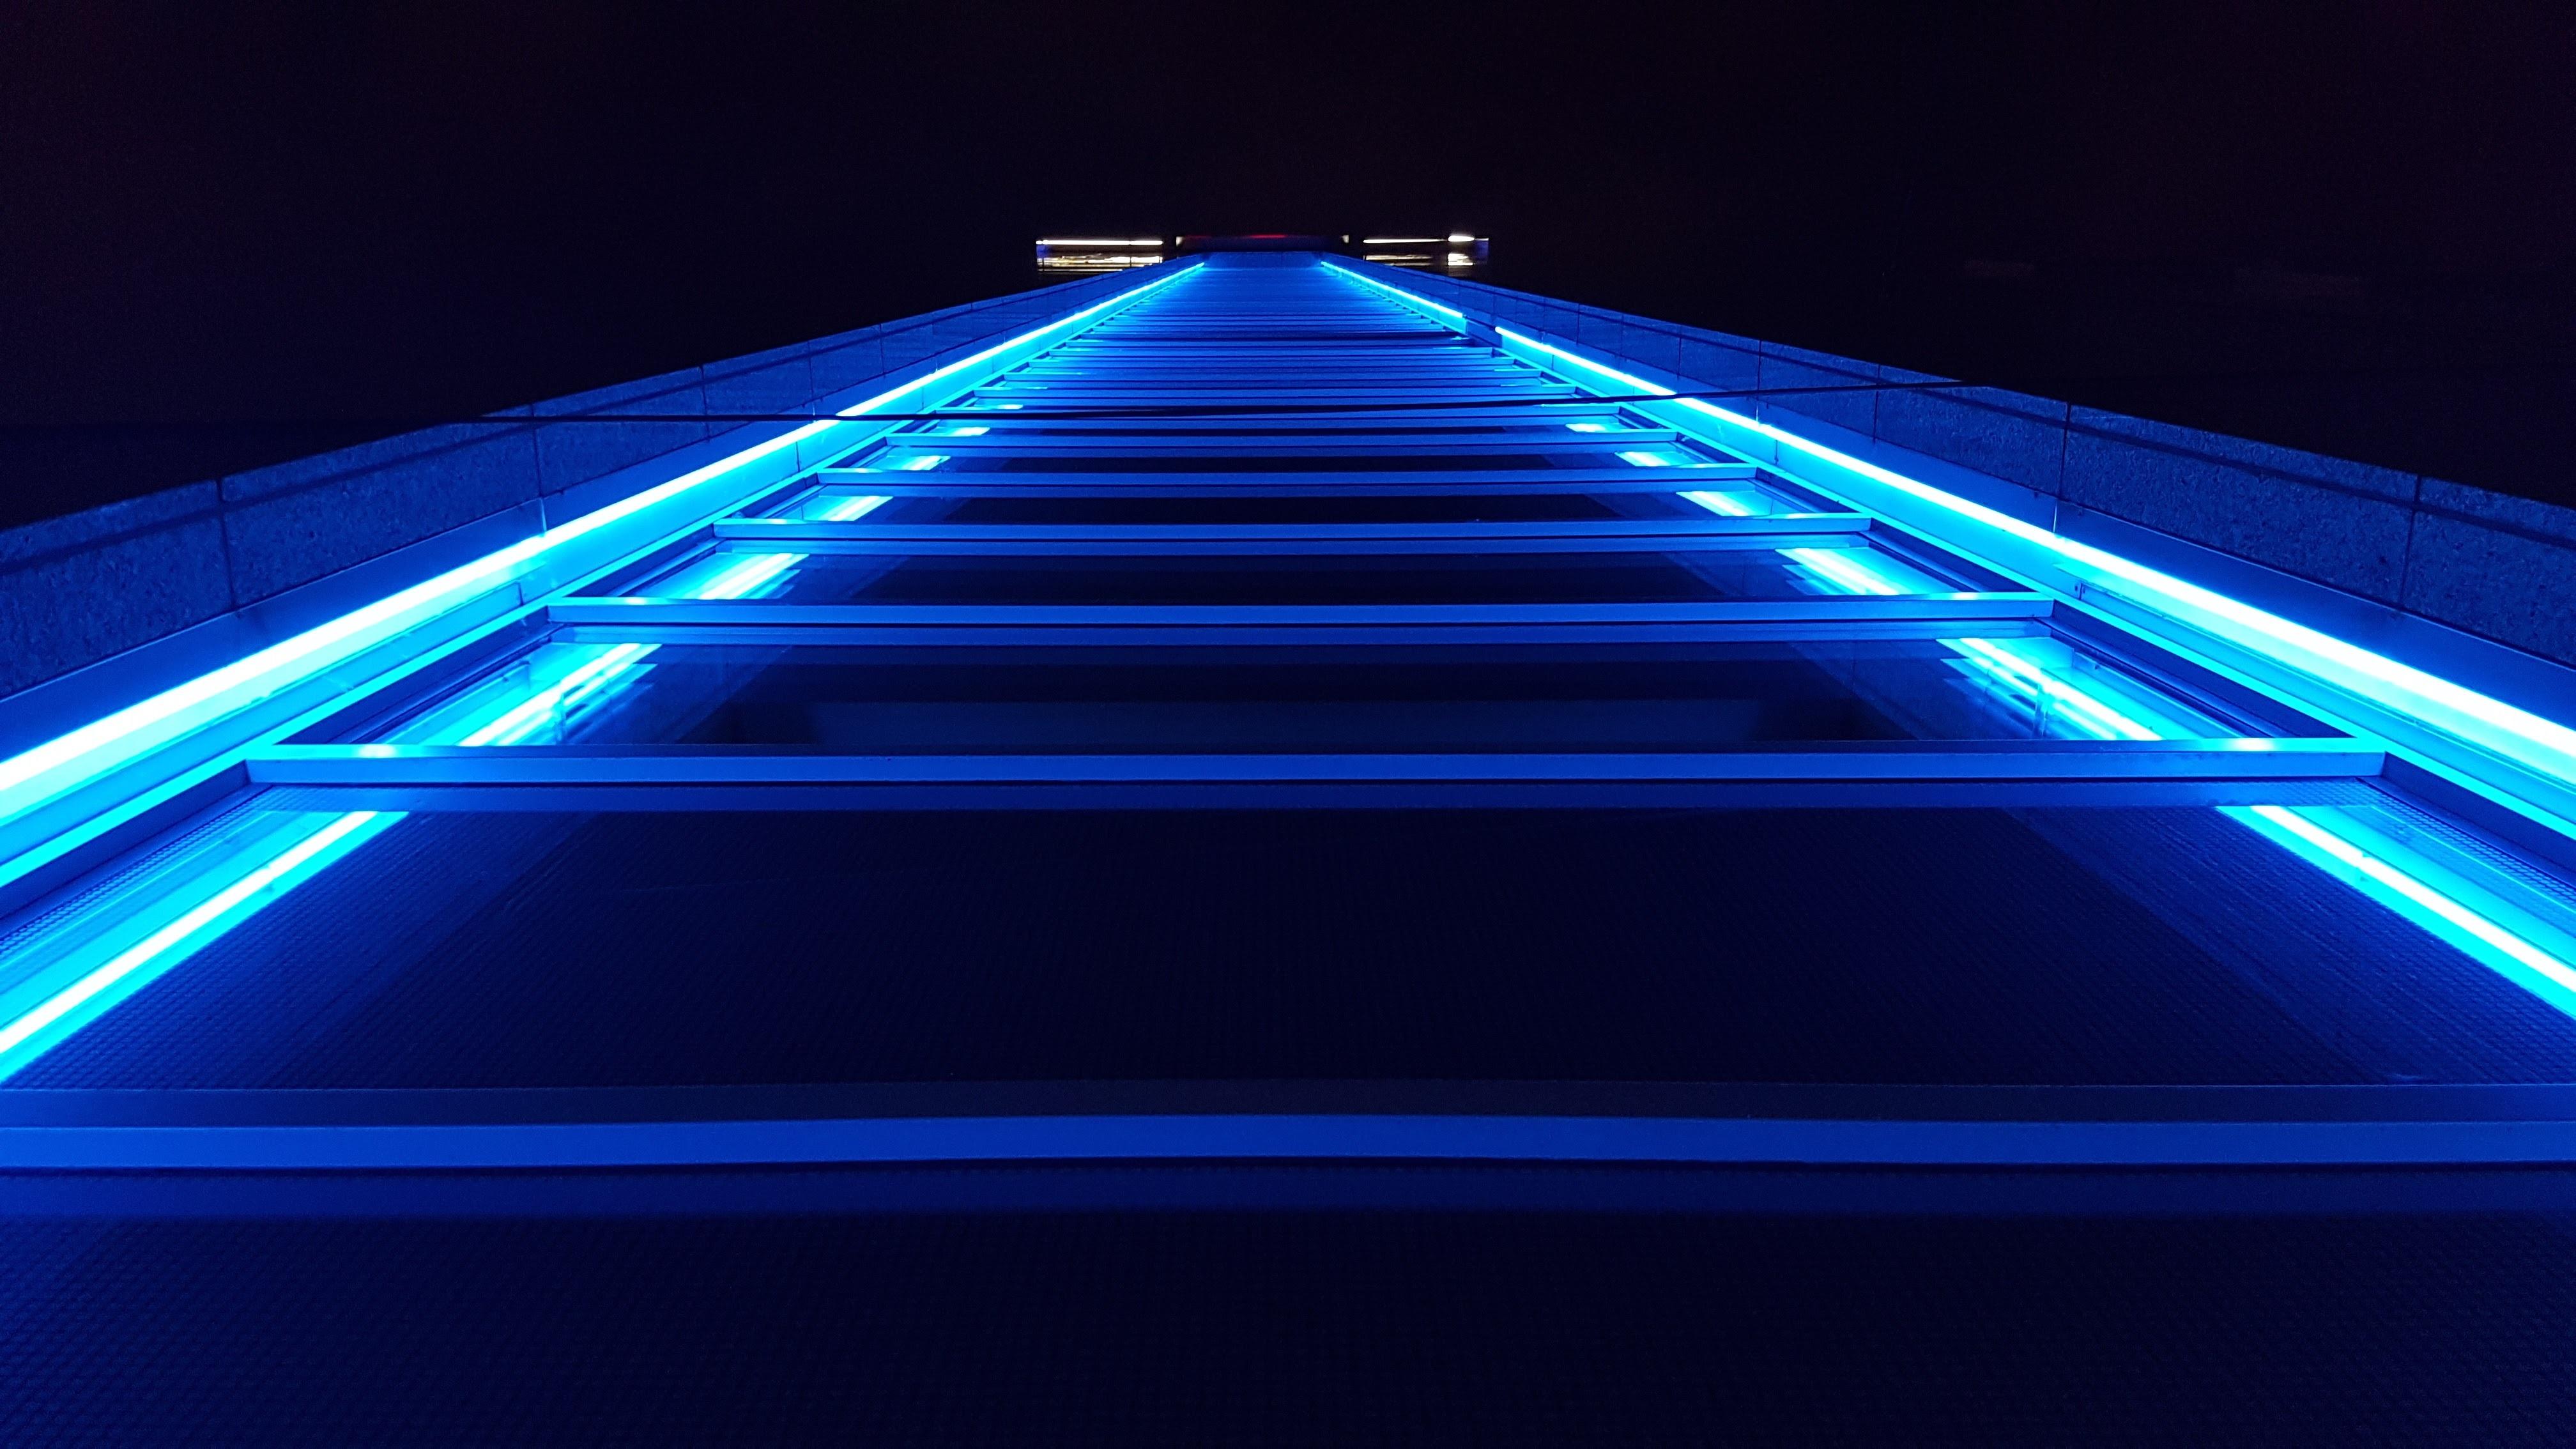 https://get.pxhere.com/photo/light-architecture-night-building-line-reflection-facade-darkness-blue-signage-lighting-laser-mood-shape-1167902.jpg